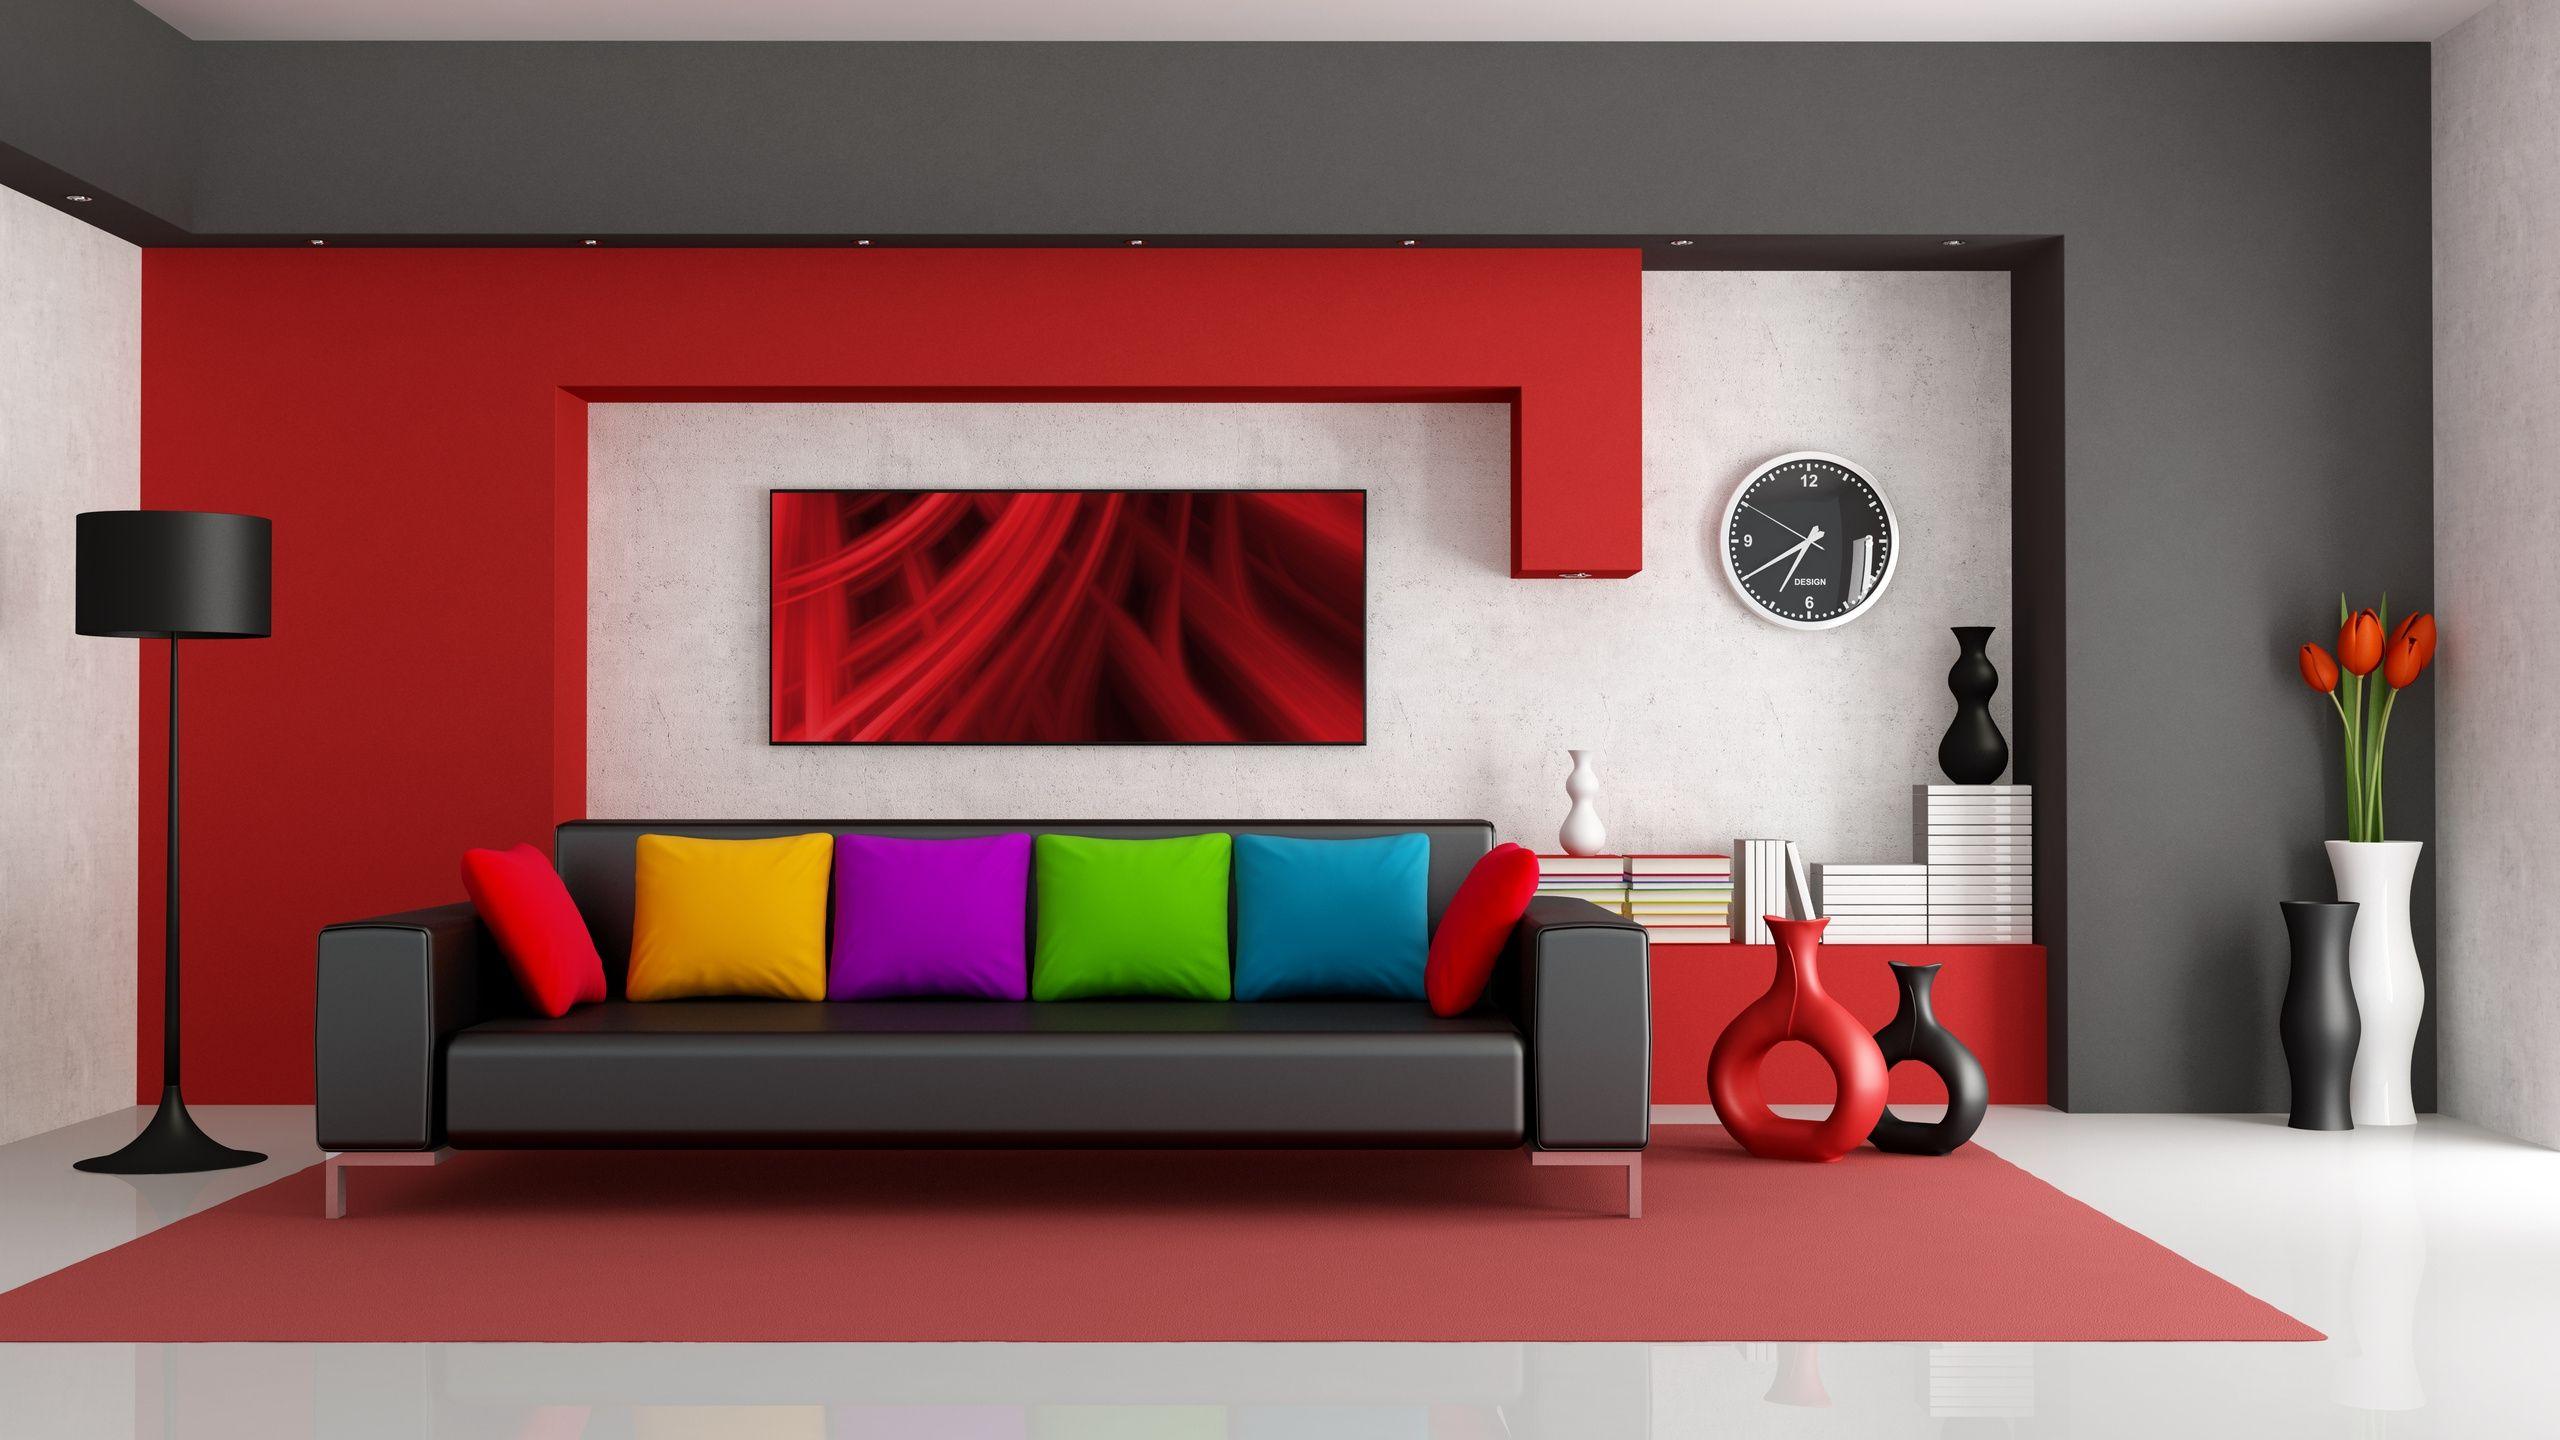 Remarkable Surprising Wallpaper Design For Living Room